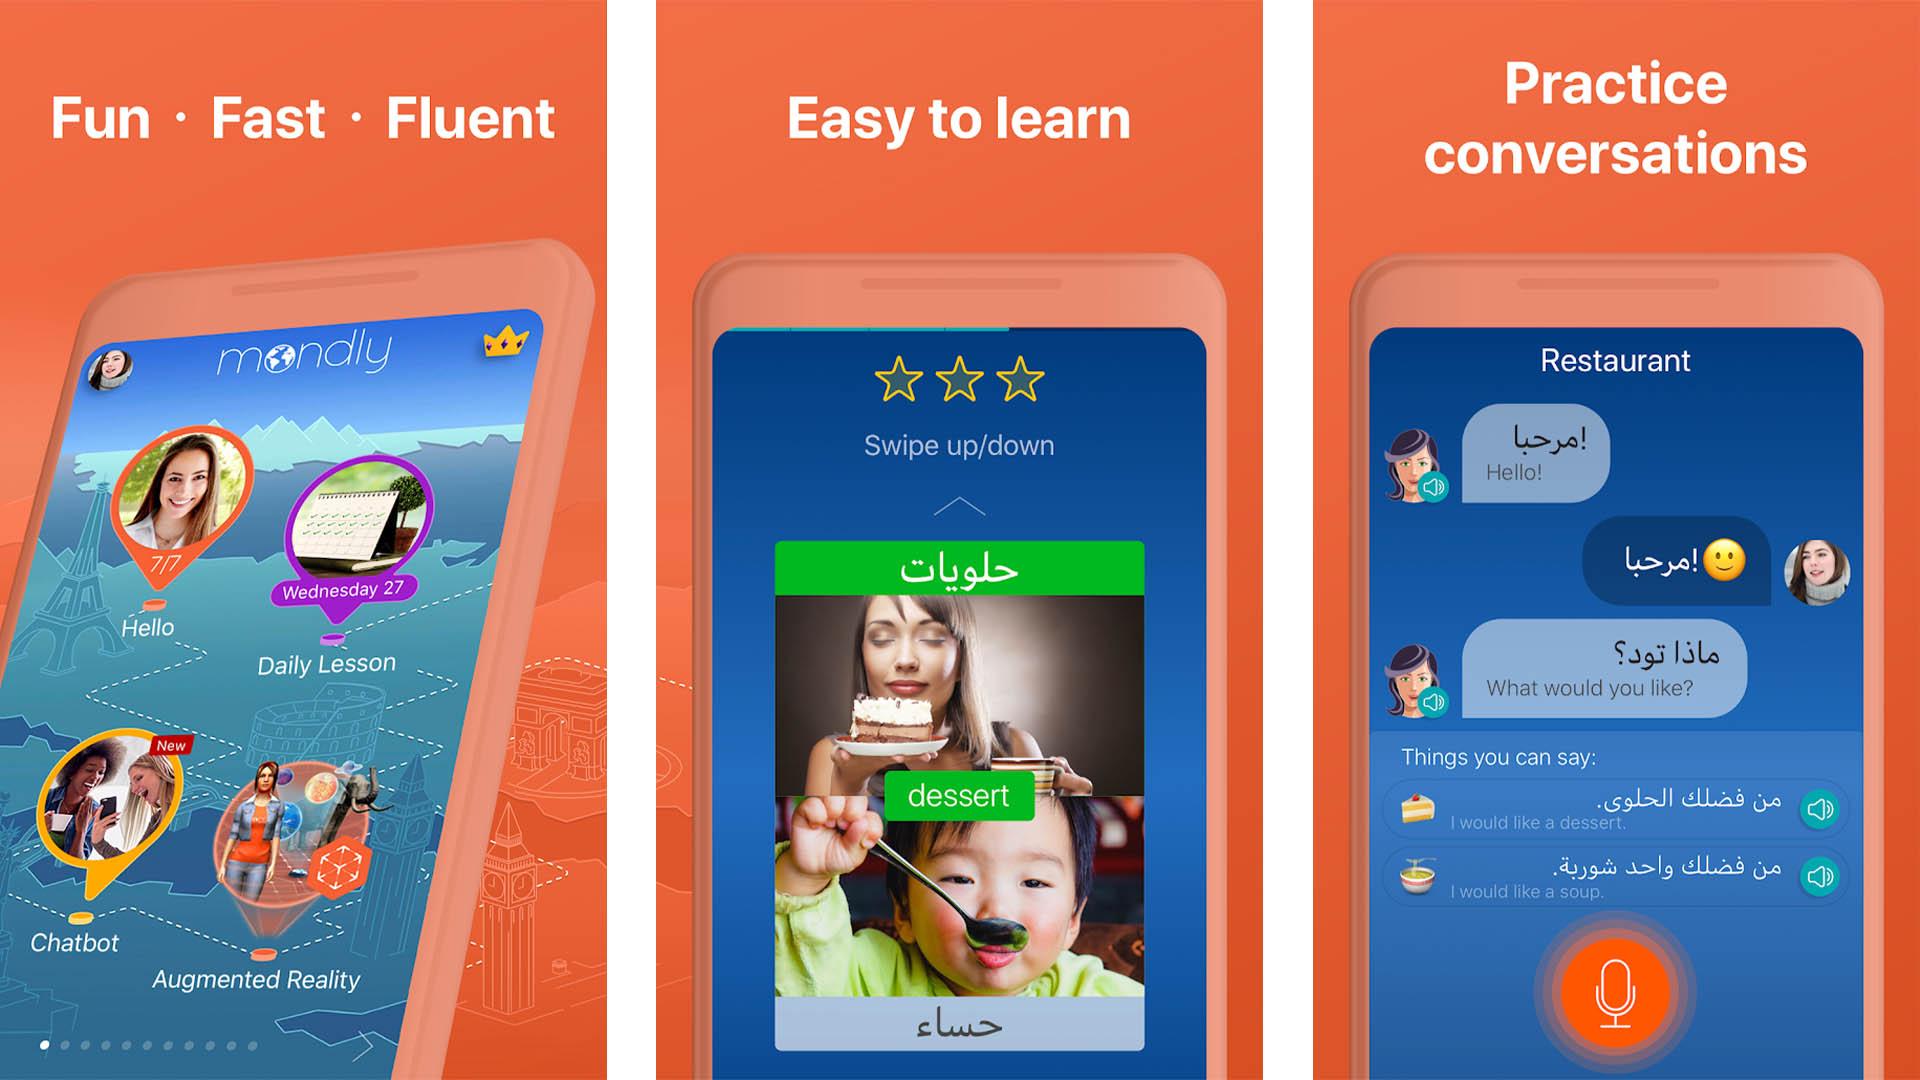 Arabic Mondly screenshot 2020